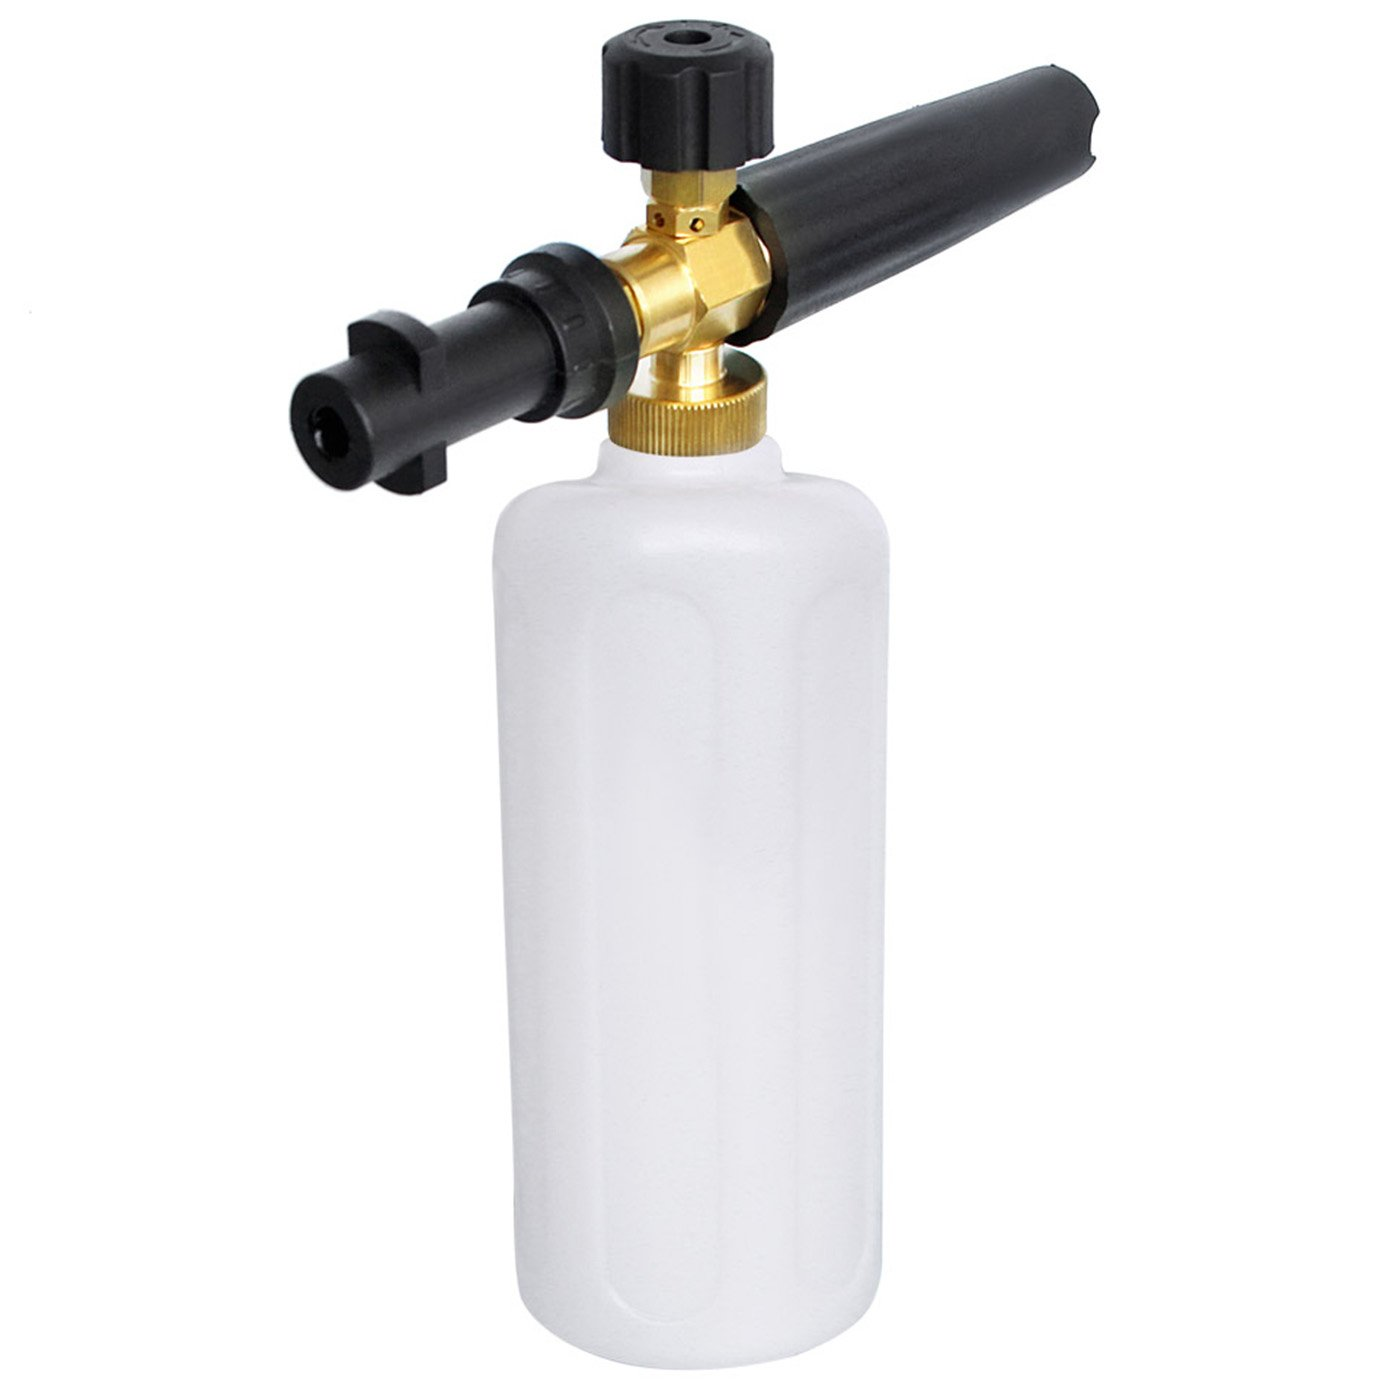 AutoCare Adjustable Foam Cannon Gun for Karcher Snow Foam Lance Adapter Soap Dispenser K Pressure Washer